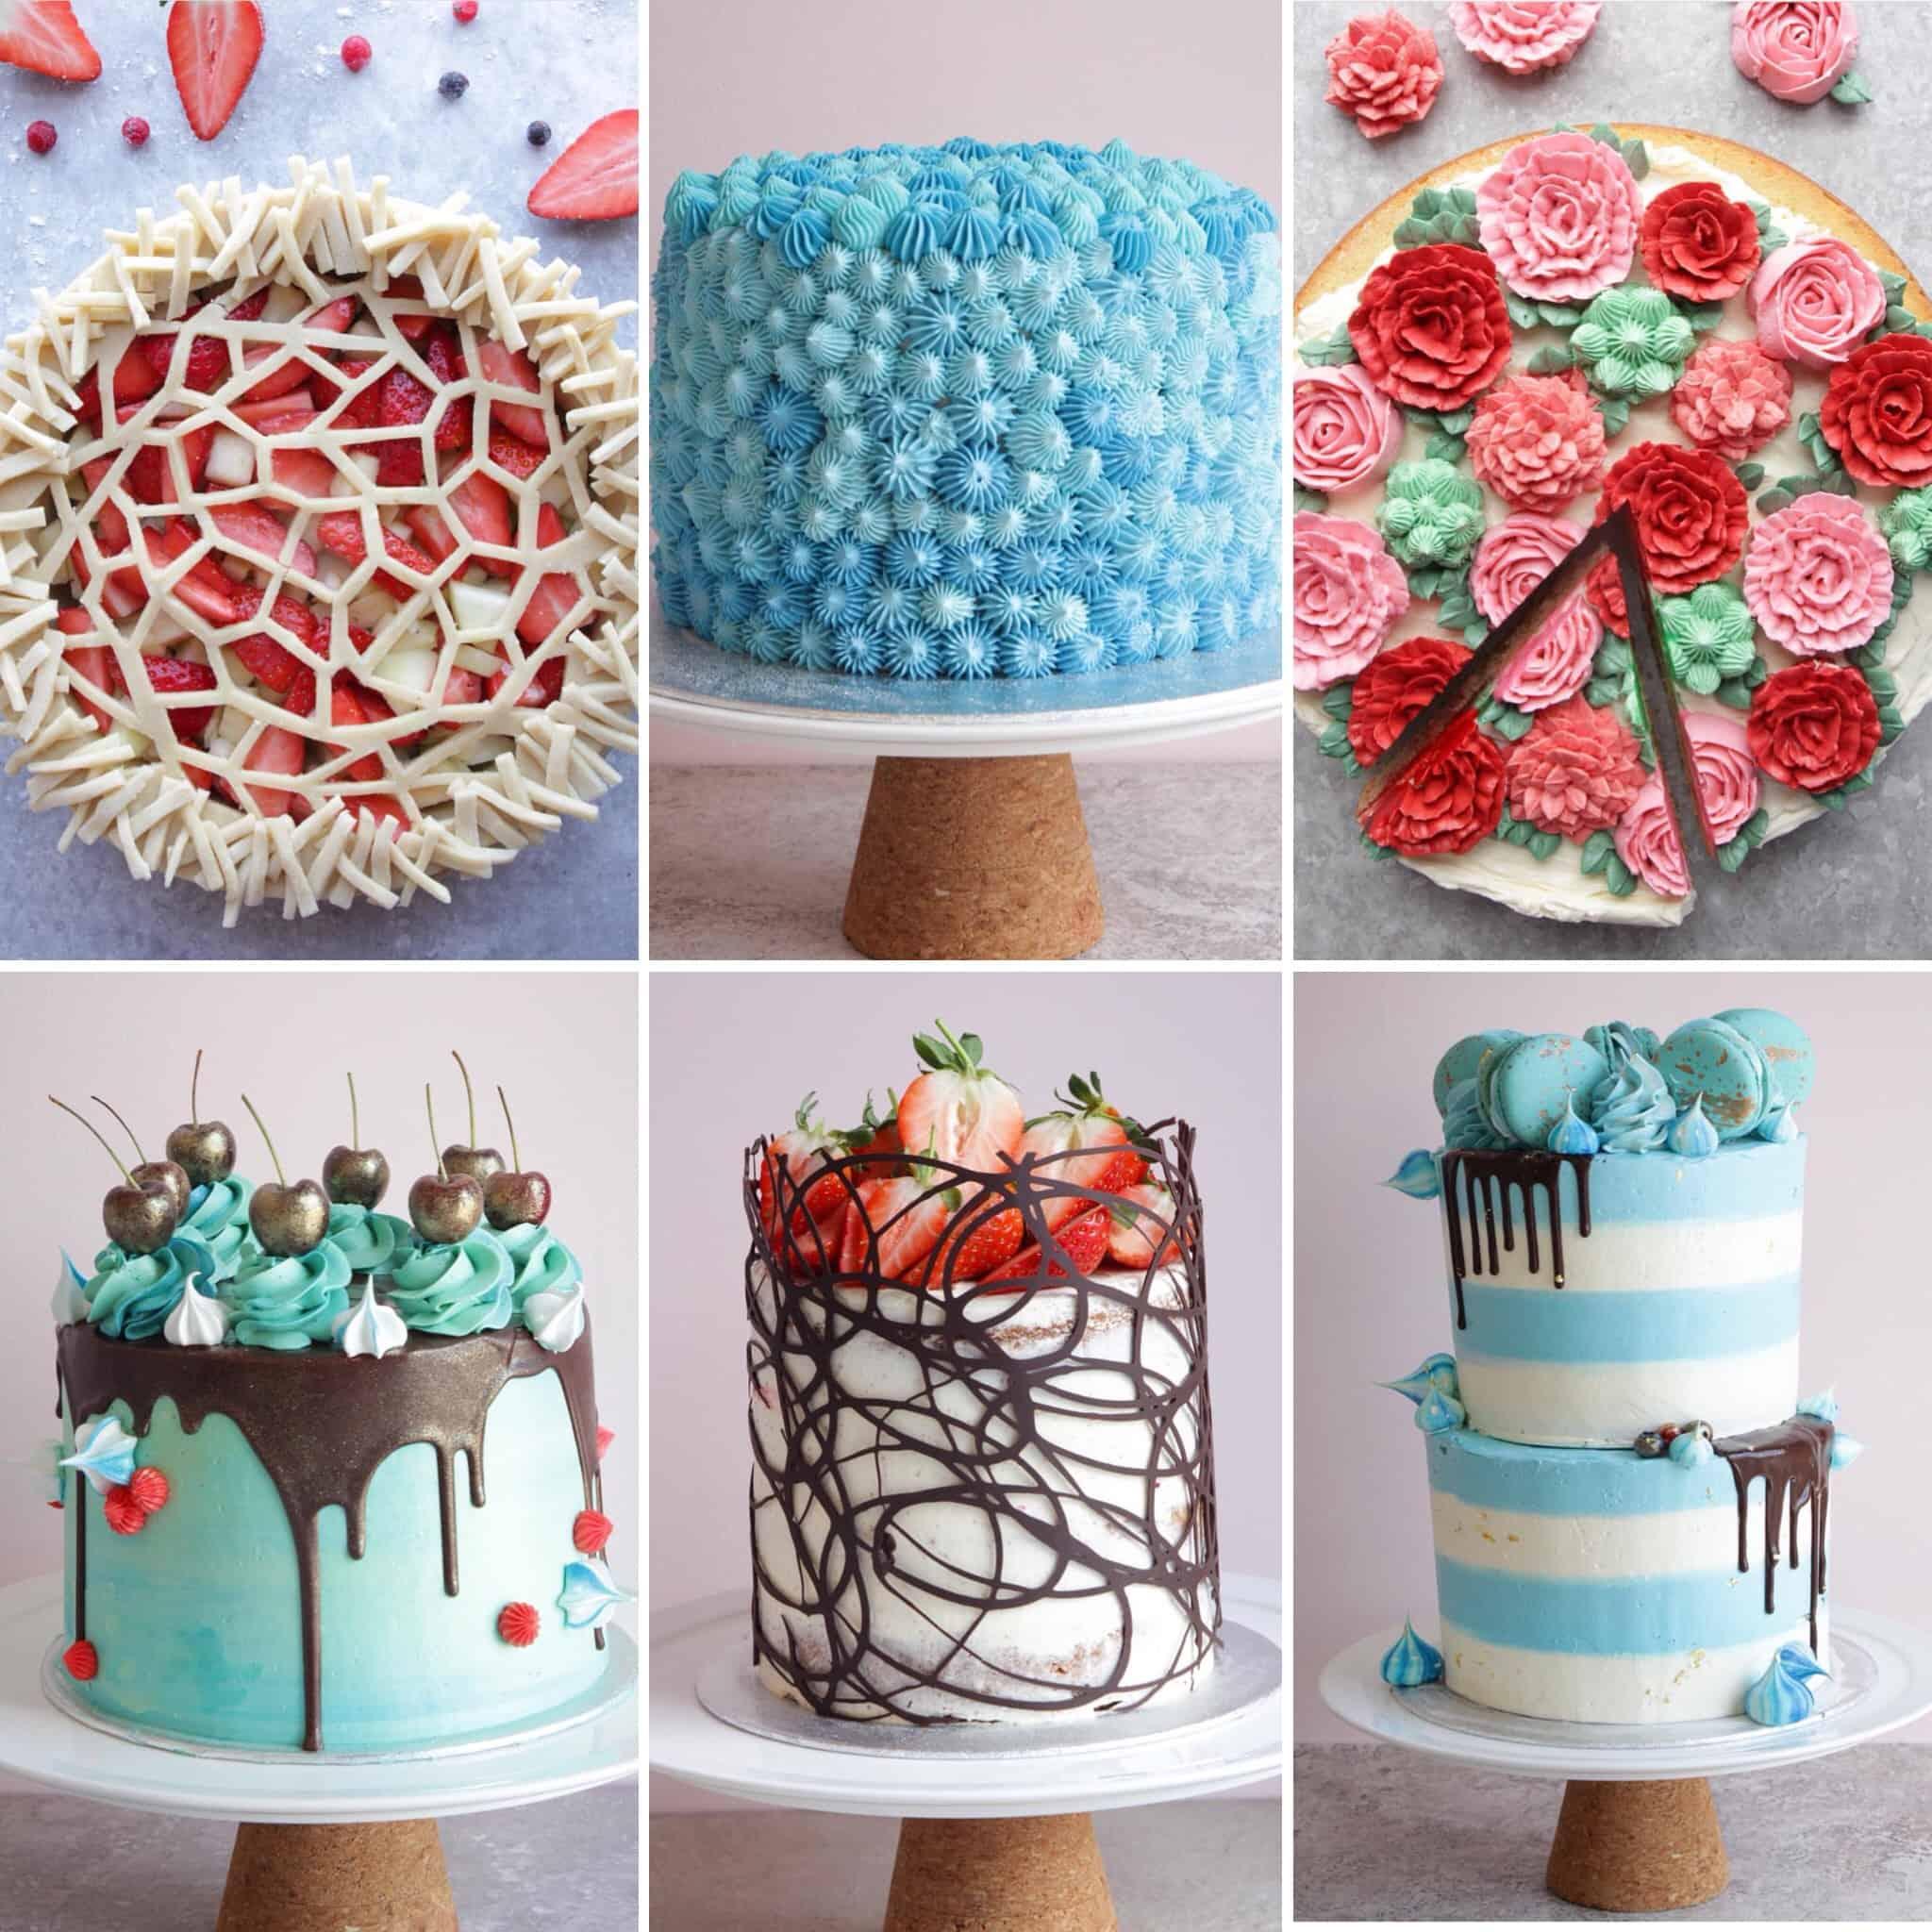 Gorgeous Cakes by YouTuber Home Baker Matt Adlard, The Topless Baker of Swoon Talent